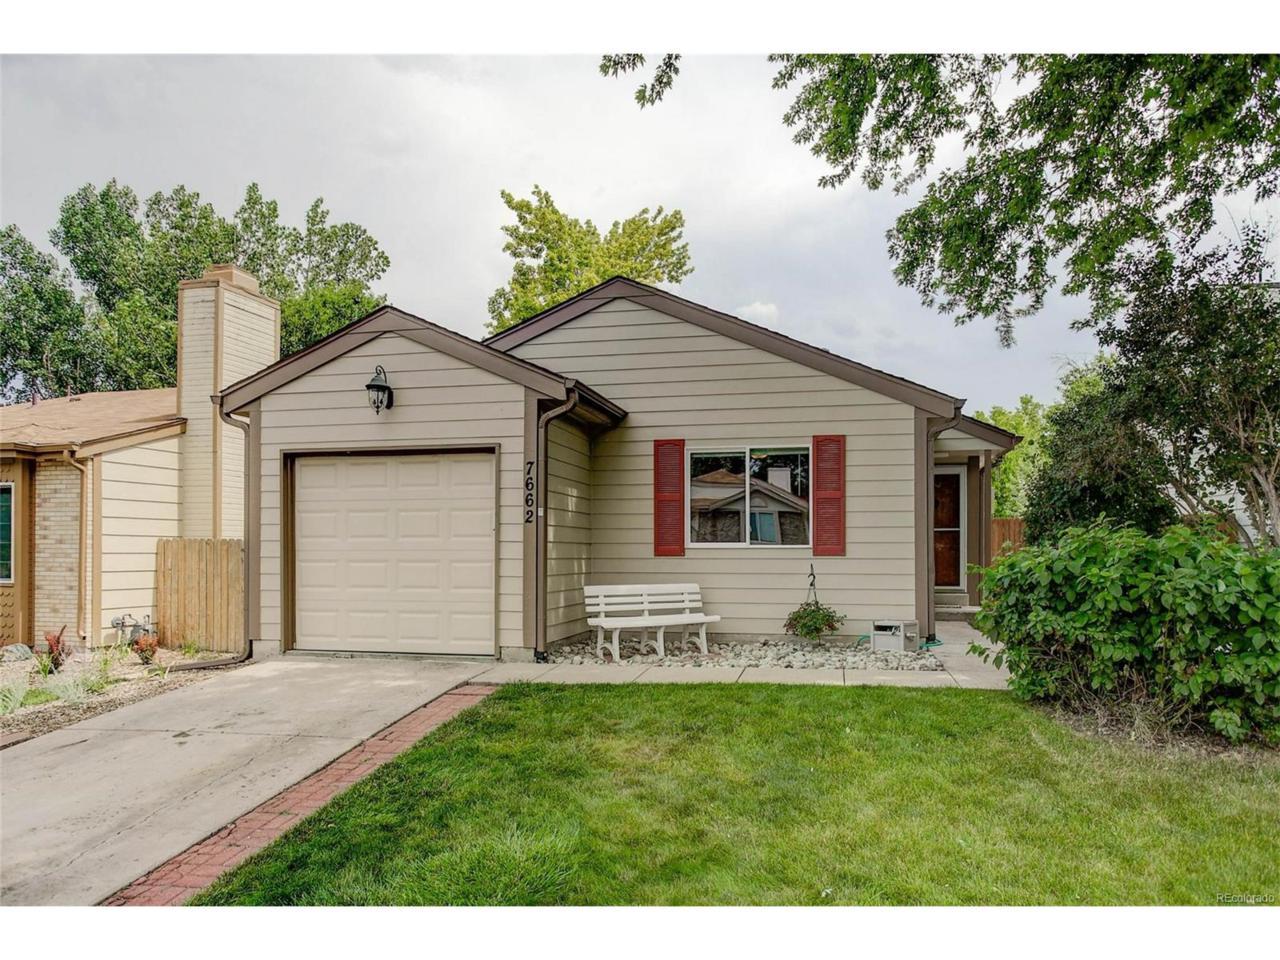 7662 Gray Way, Arvada, CO 80003 (MLS #2833418) :: 8z Real Estate